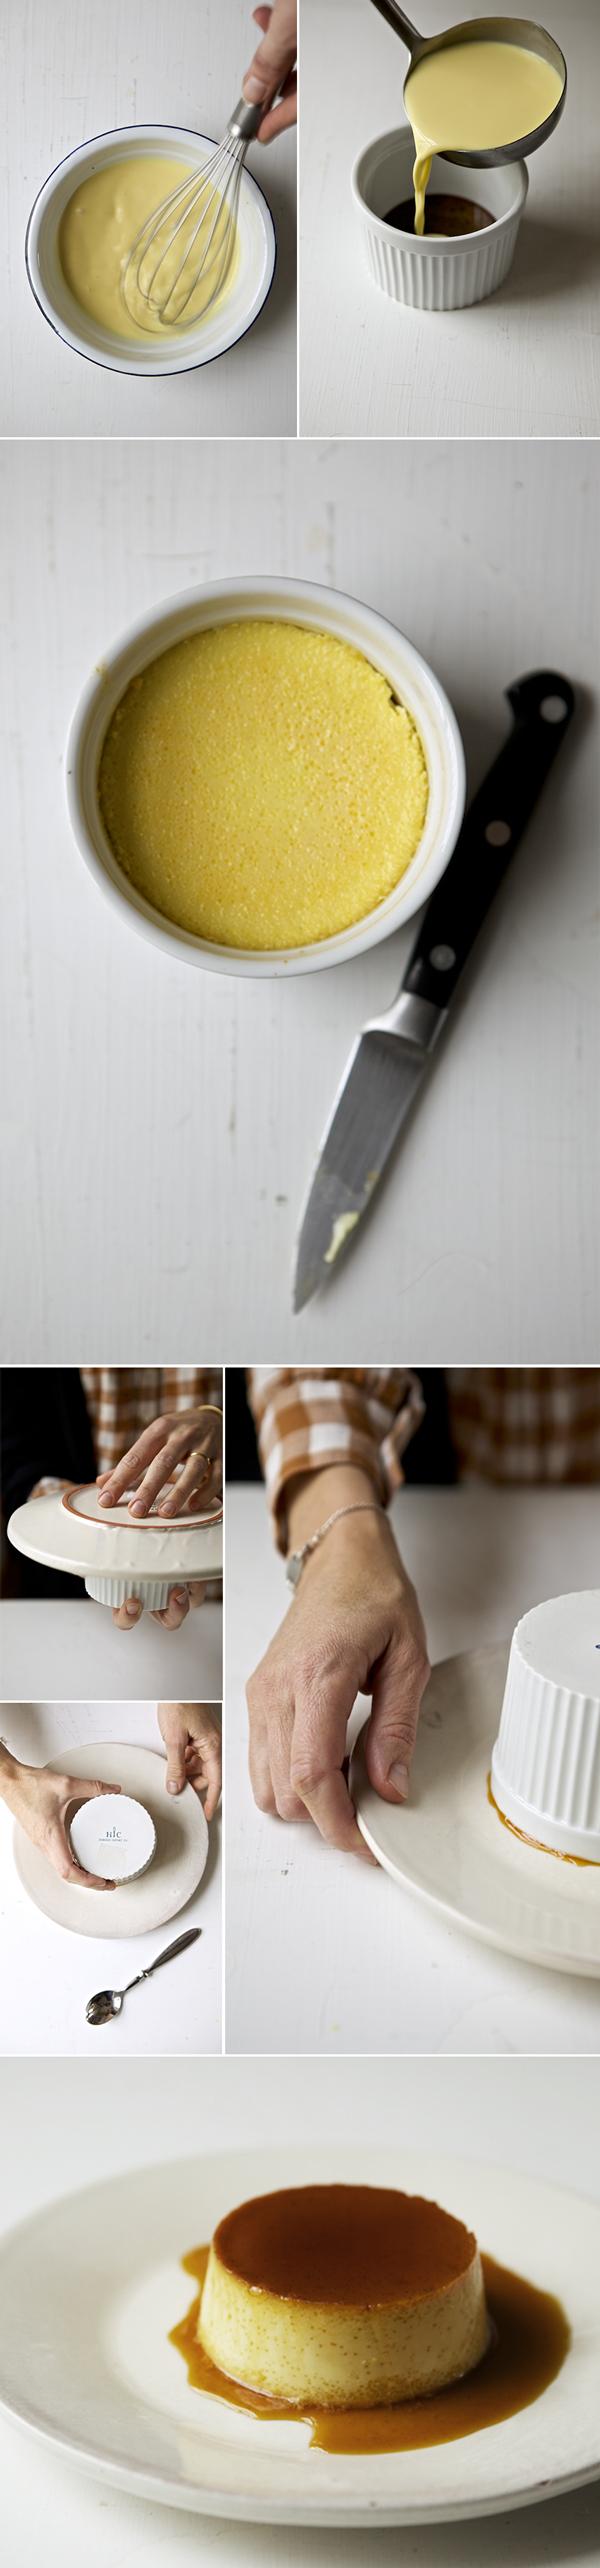 Evi-Abeler-Photography-butternut-squash-flan.jpg